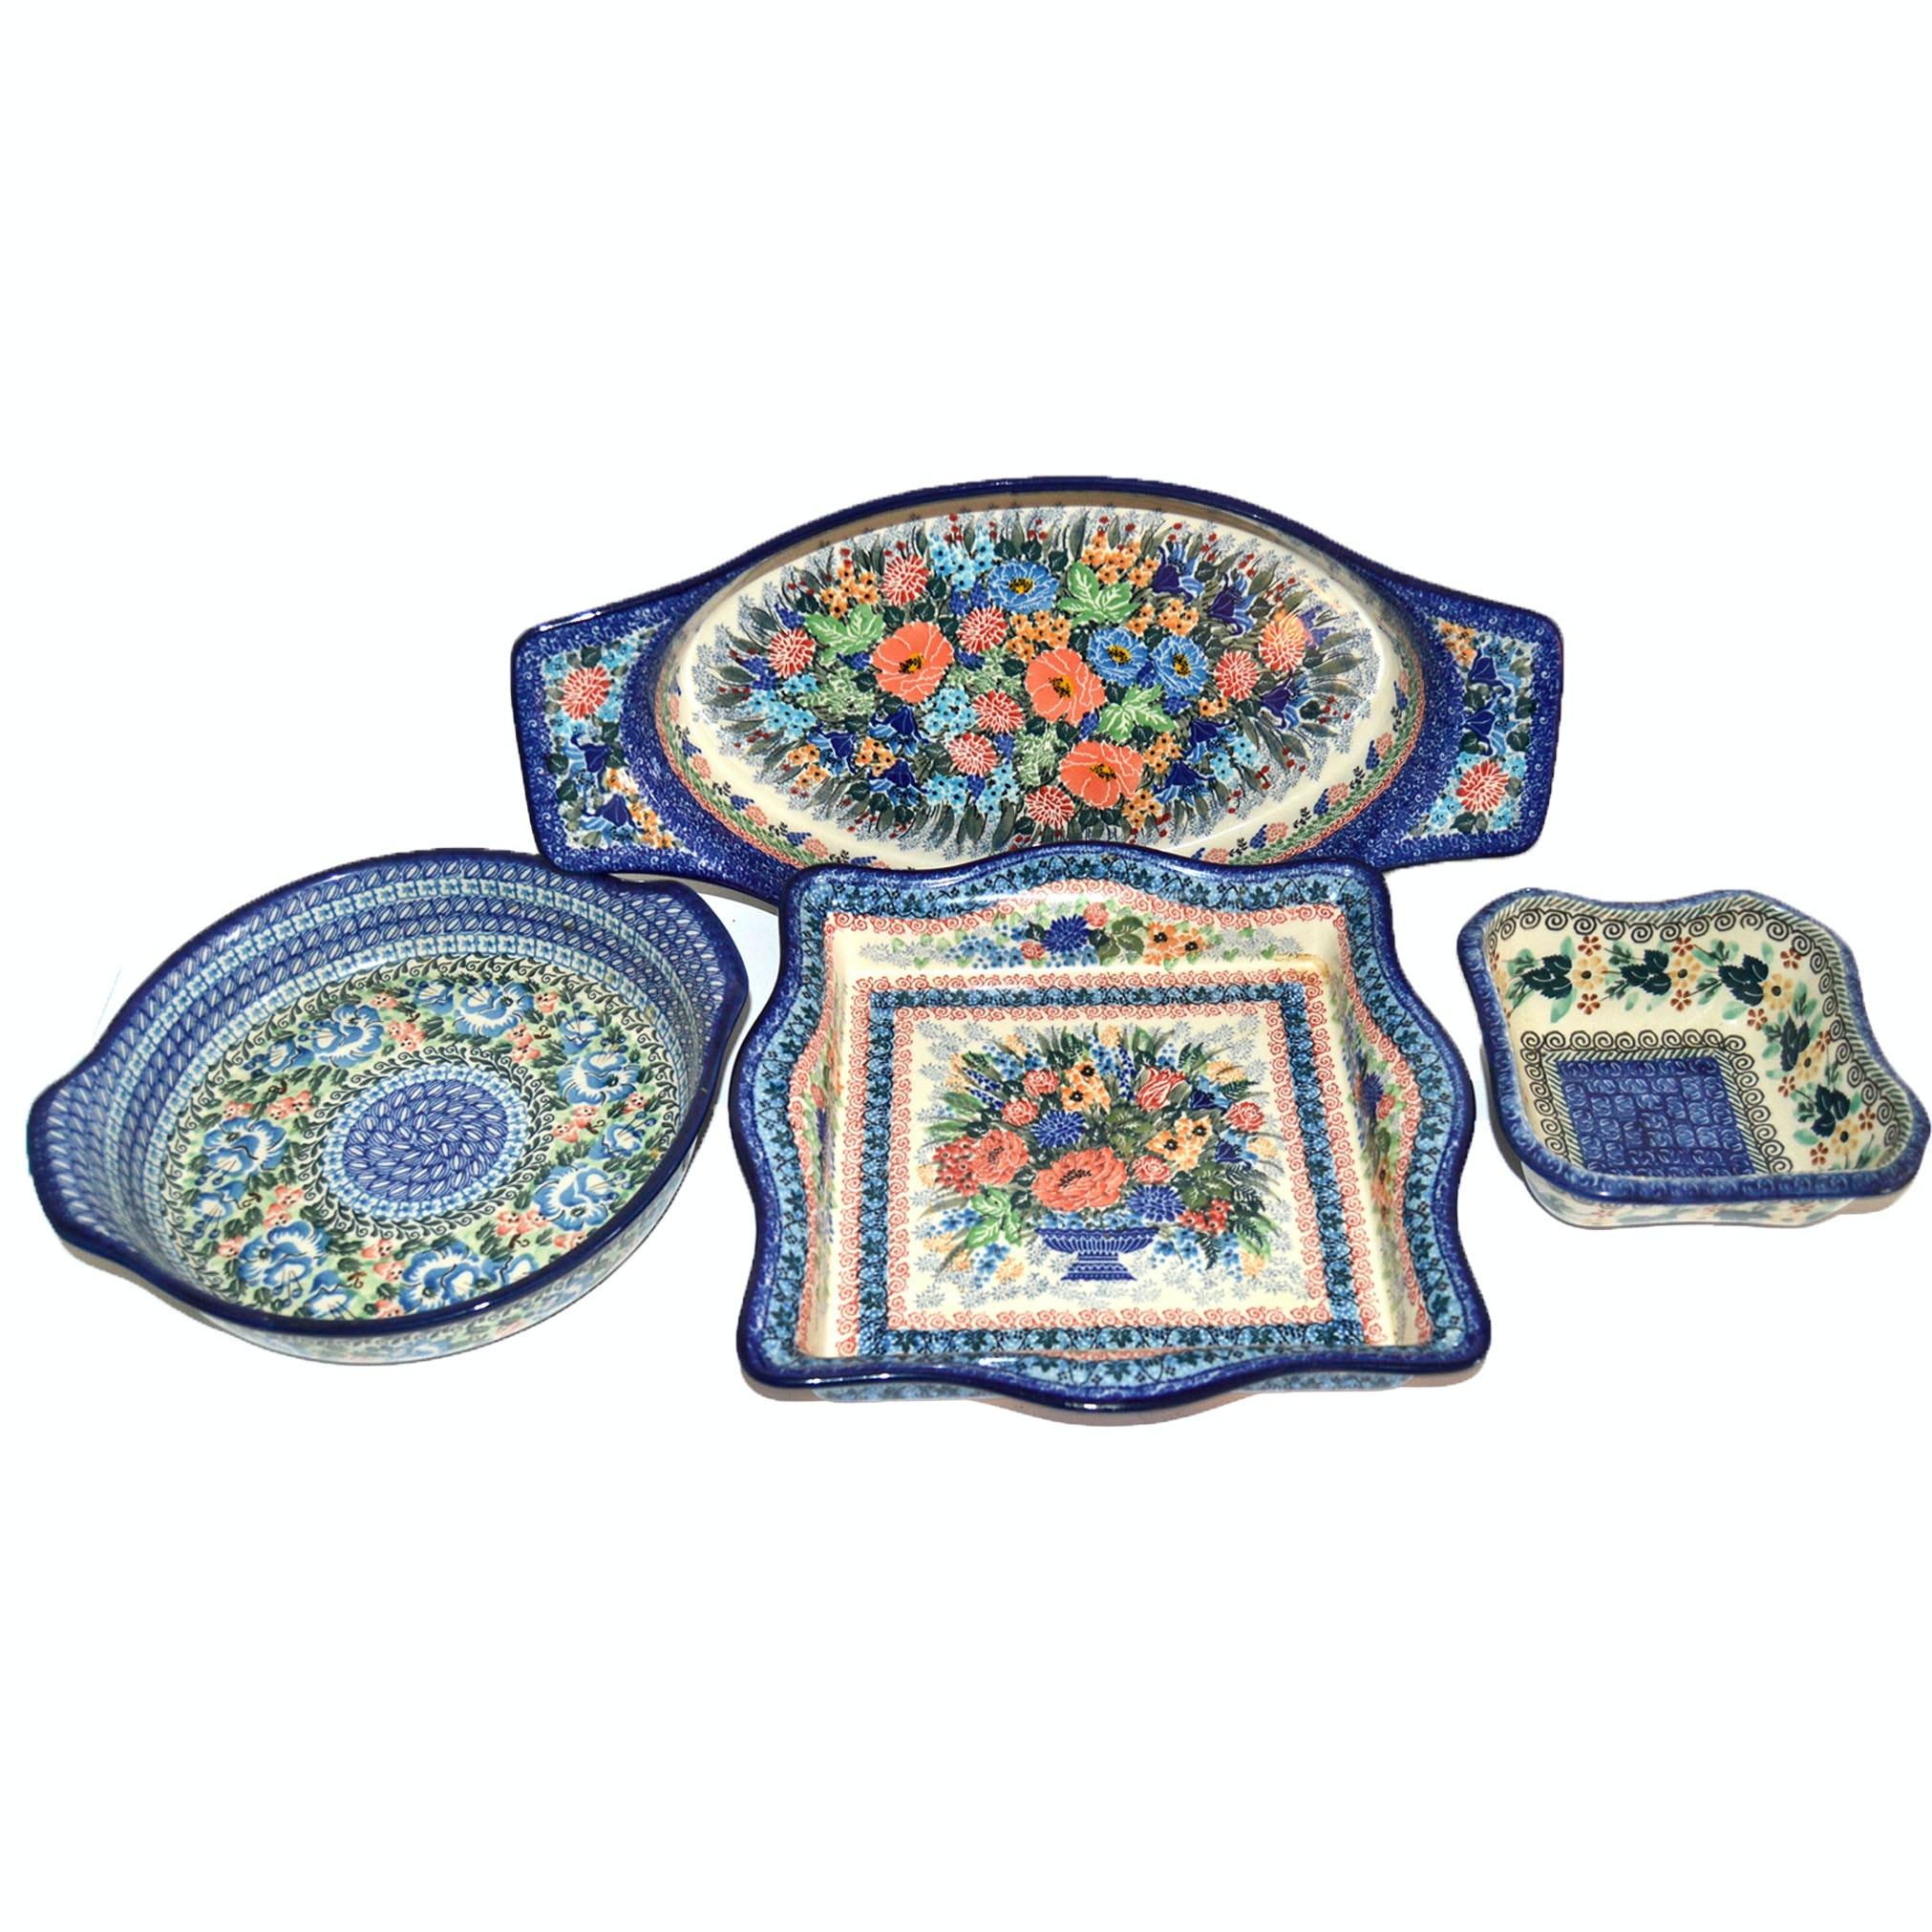 Unikat Hand-Made Polish Pottery